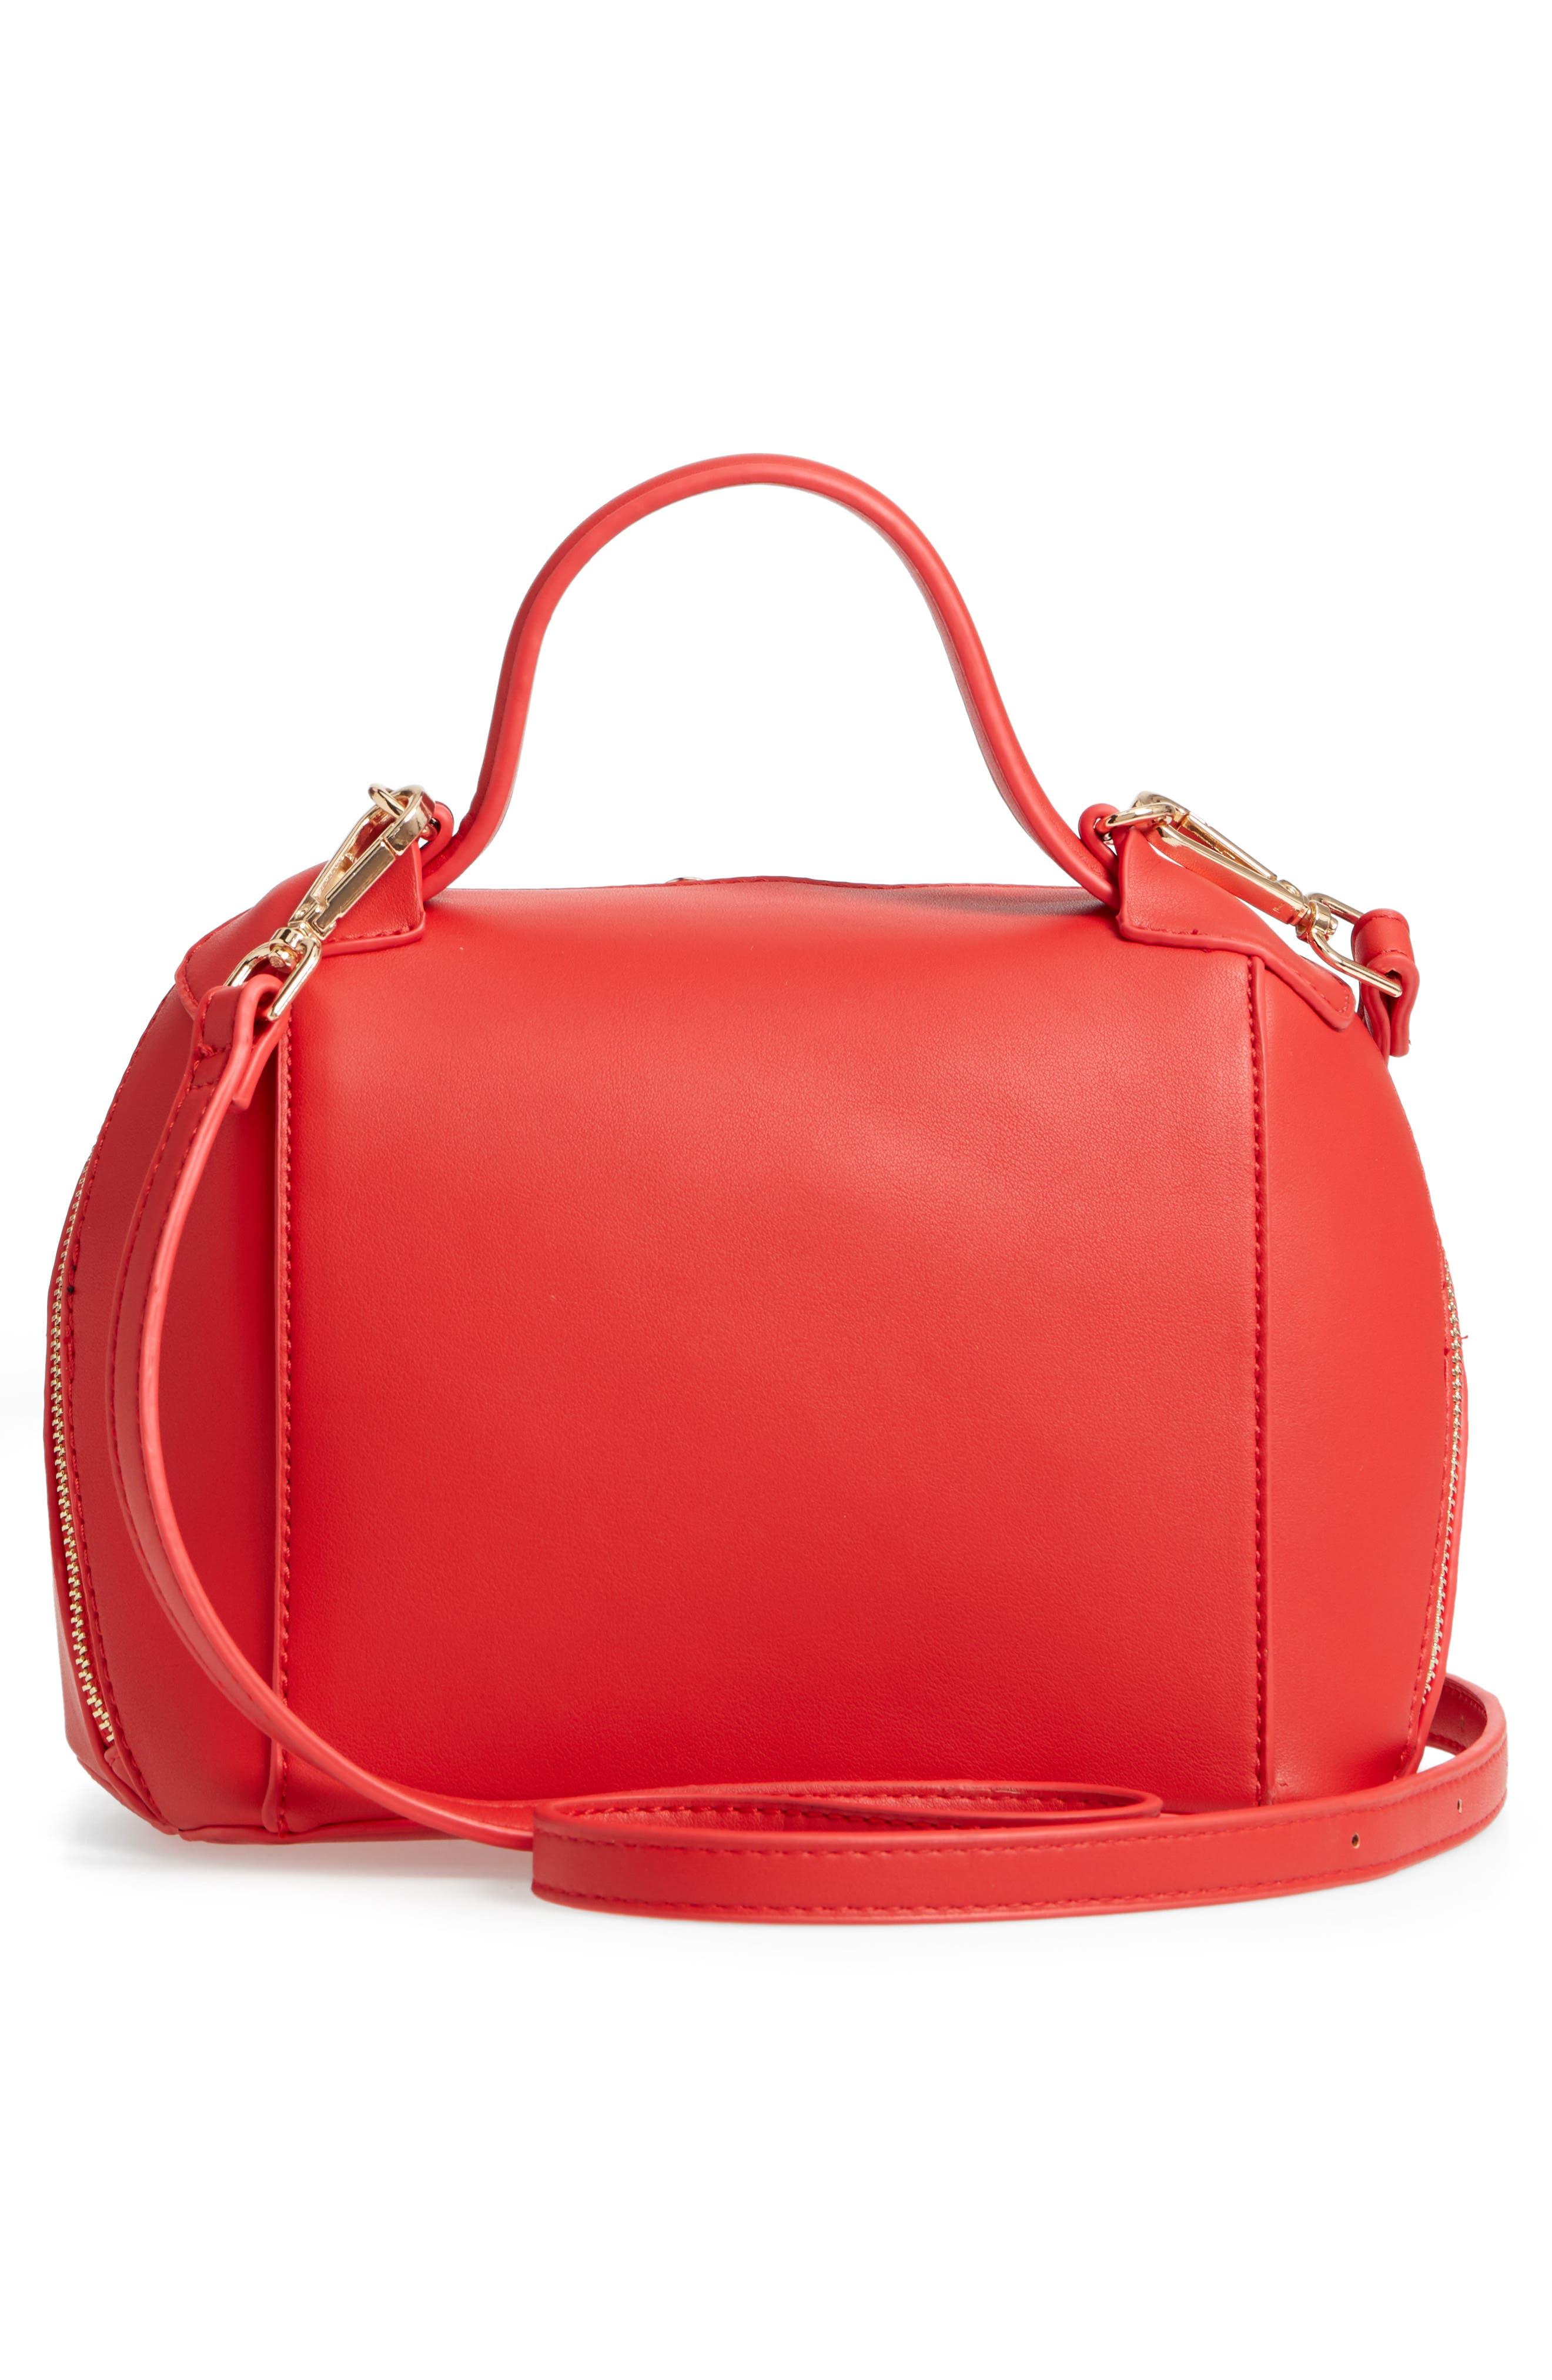 Top Handle Crossbody Bag,                             Alternate thumbnail 3, color,                             600